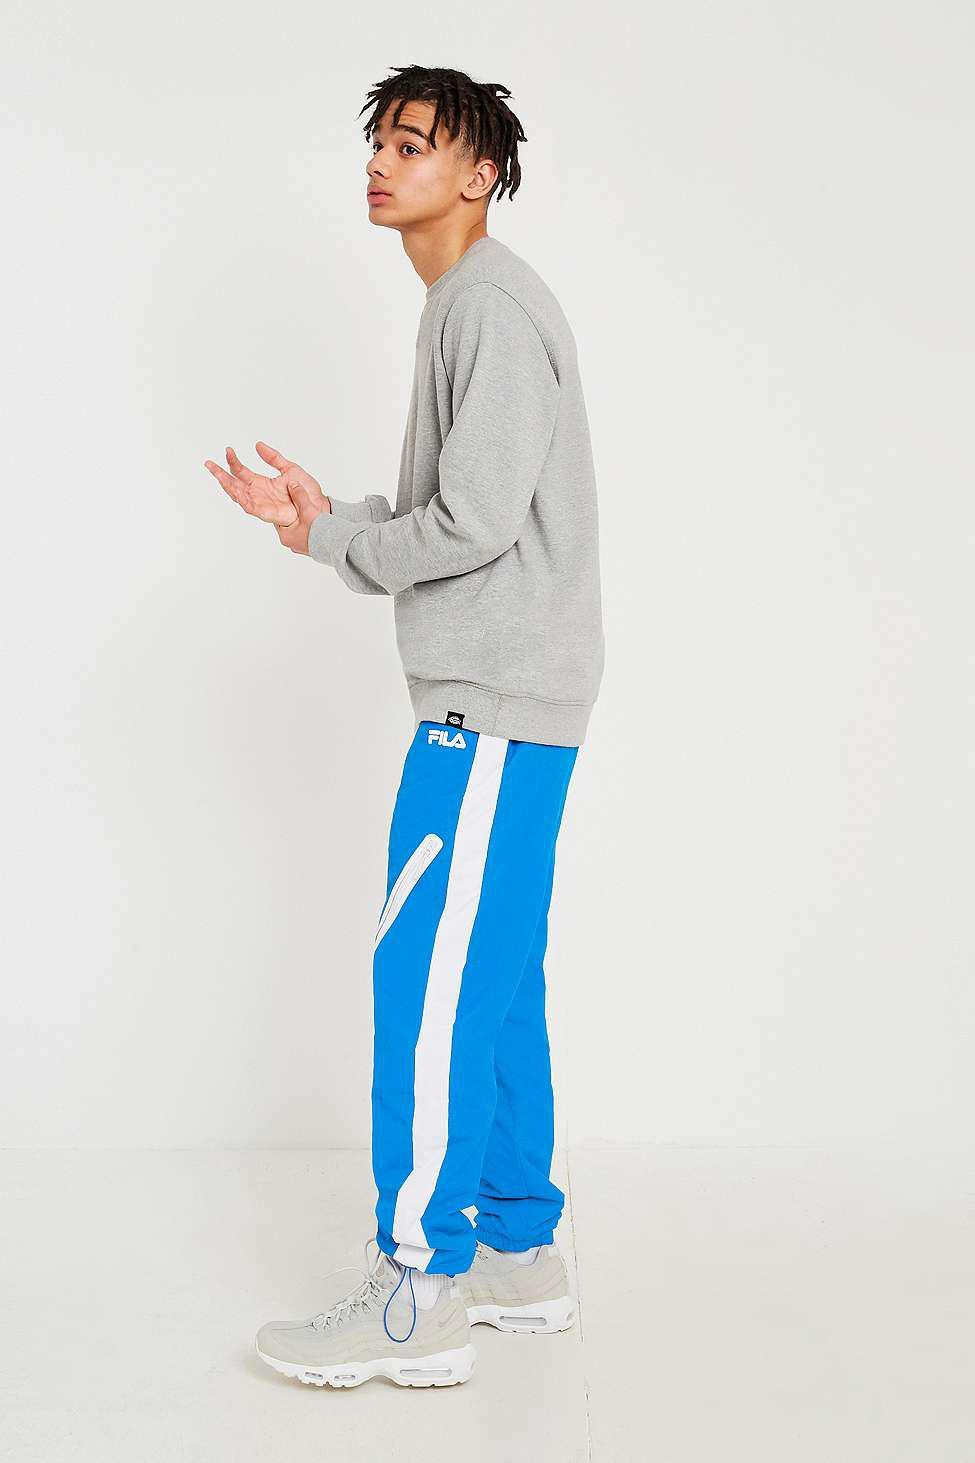 8da802fb12 Fila Blue Nylon Ski Pants - Mens S in Blue for Men - Lyst